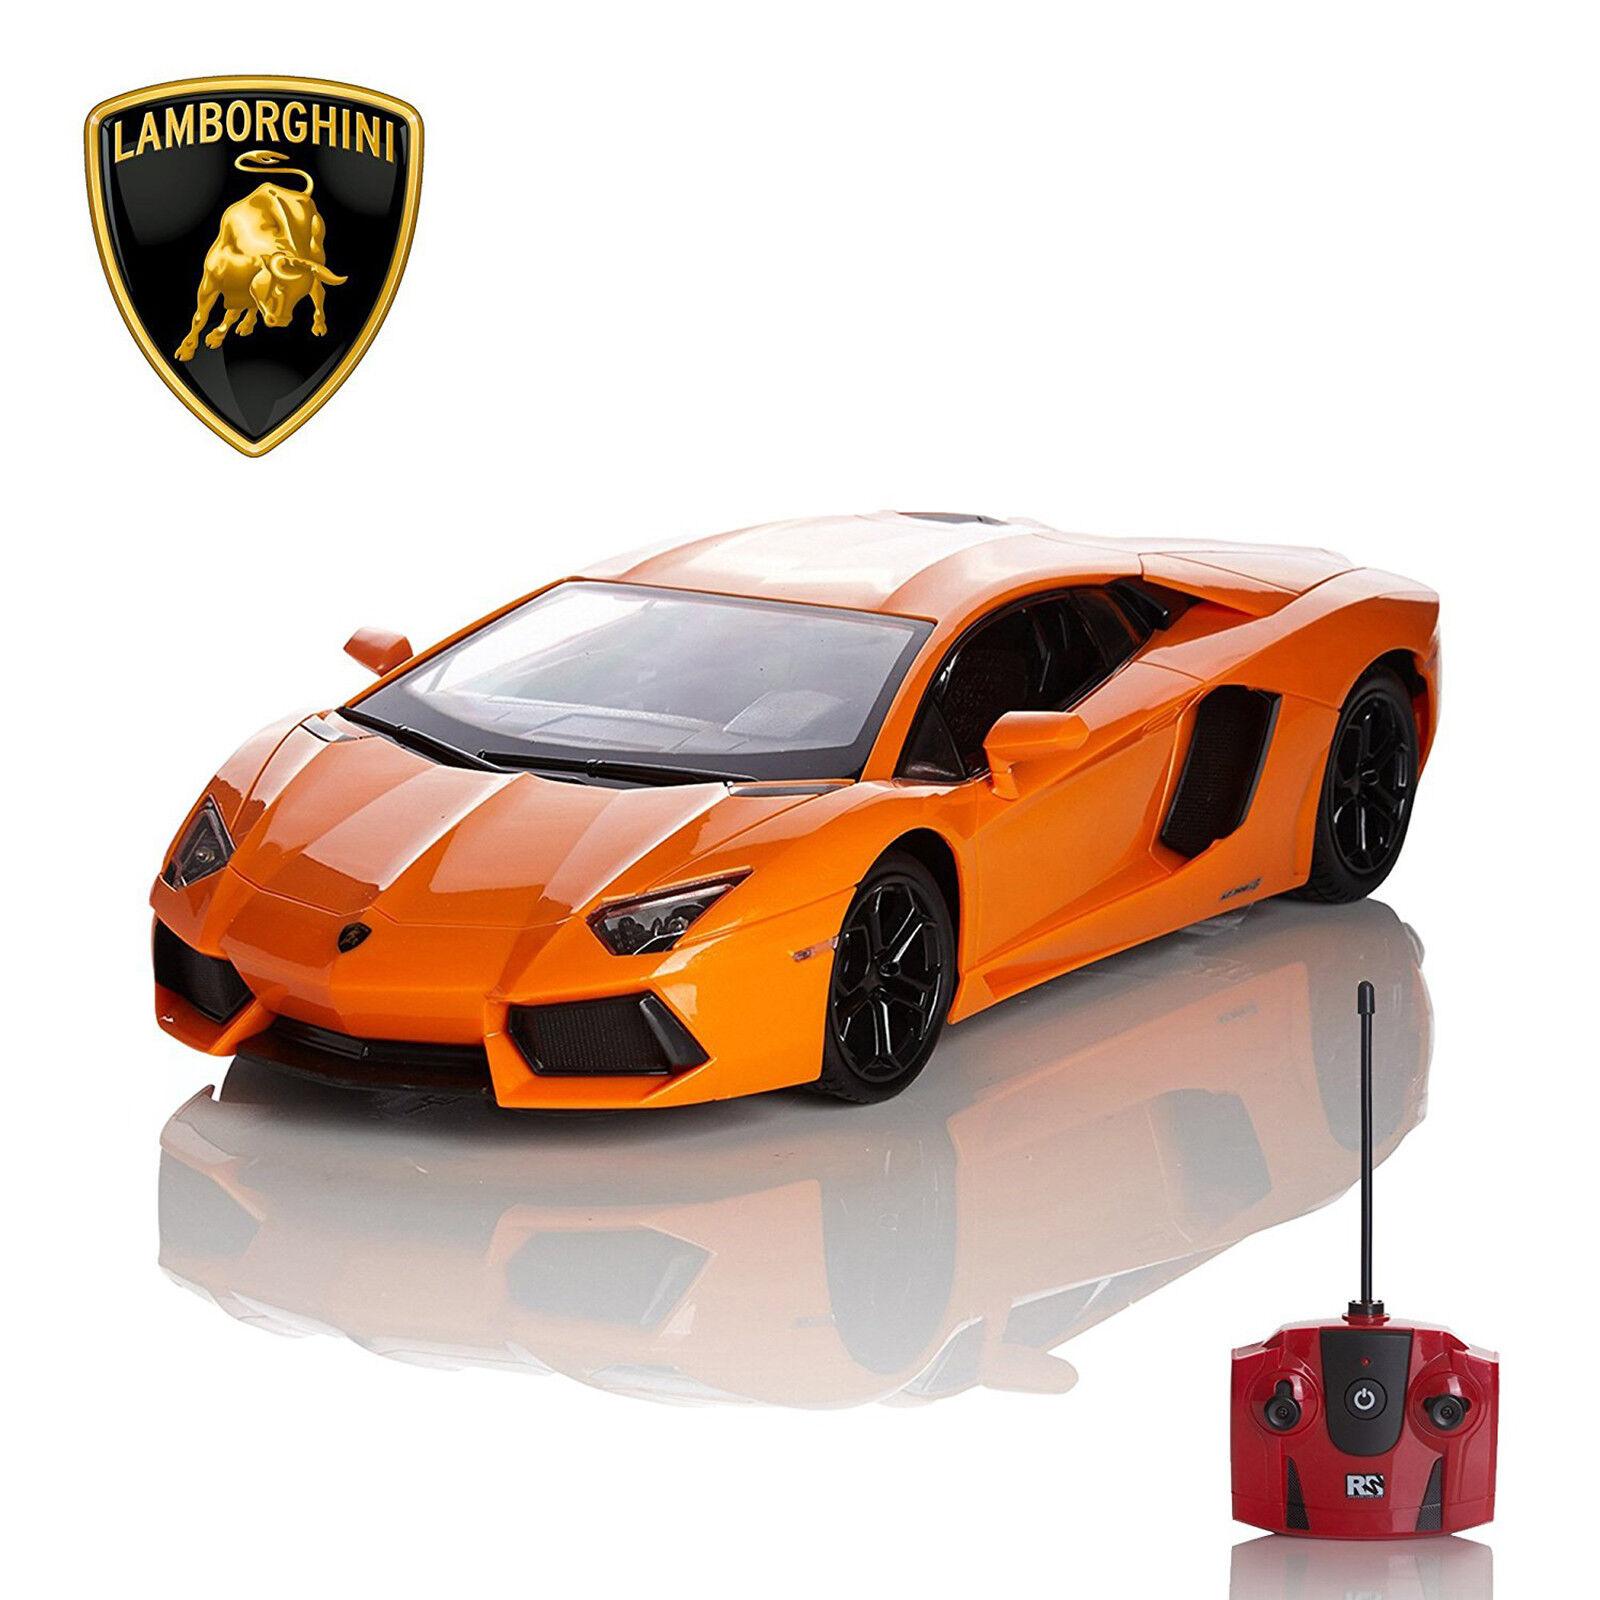 Official Lamborghini Aventador Lp700 4 Rc Toy Car Radio Controlled